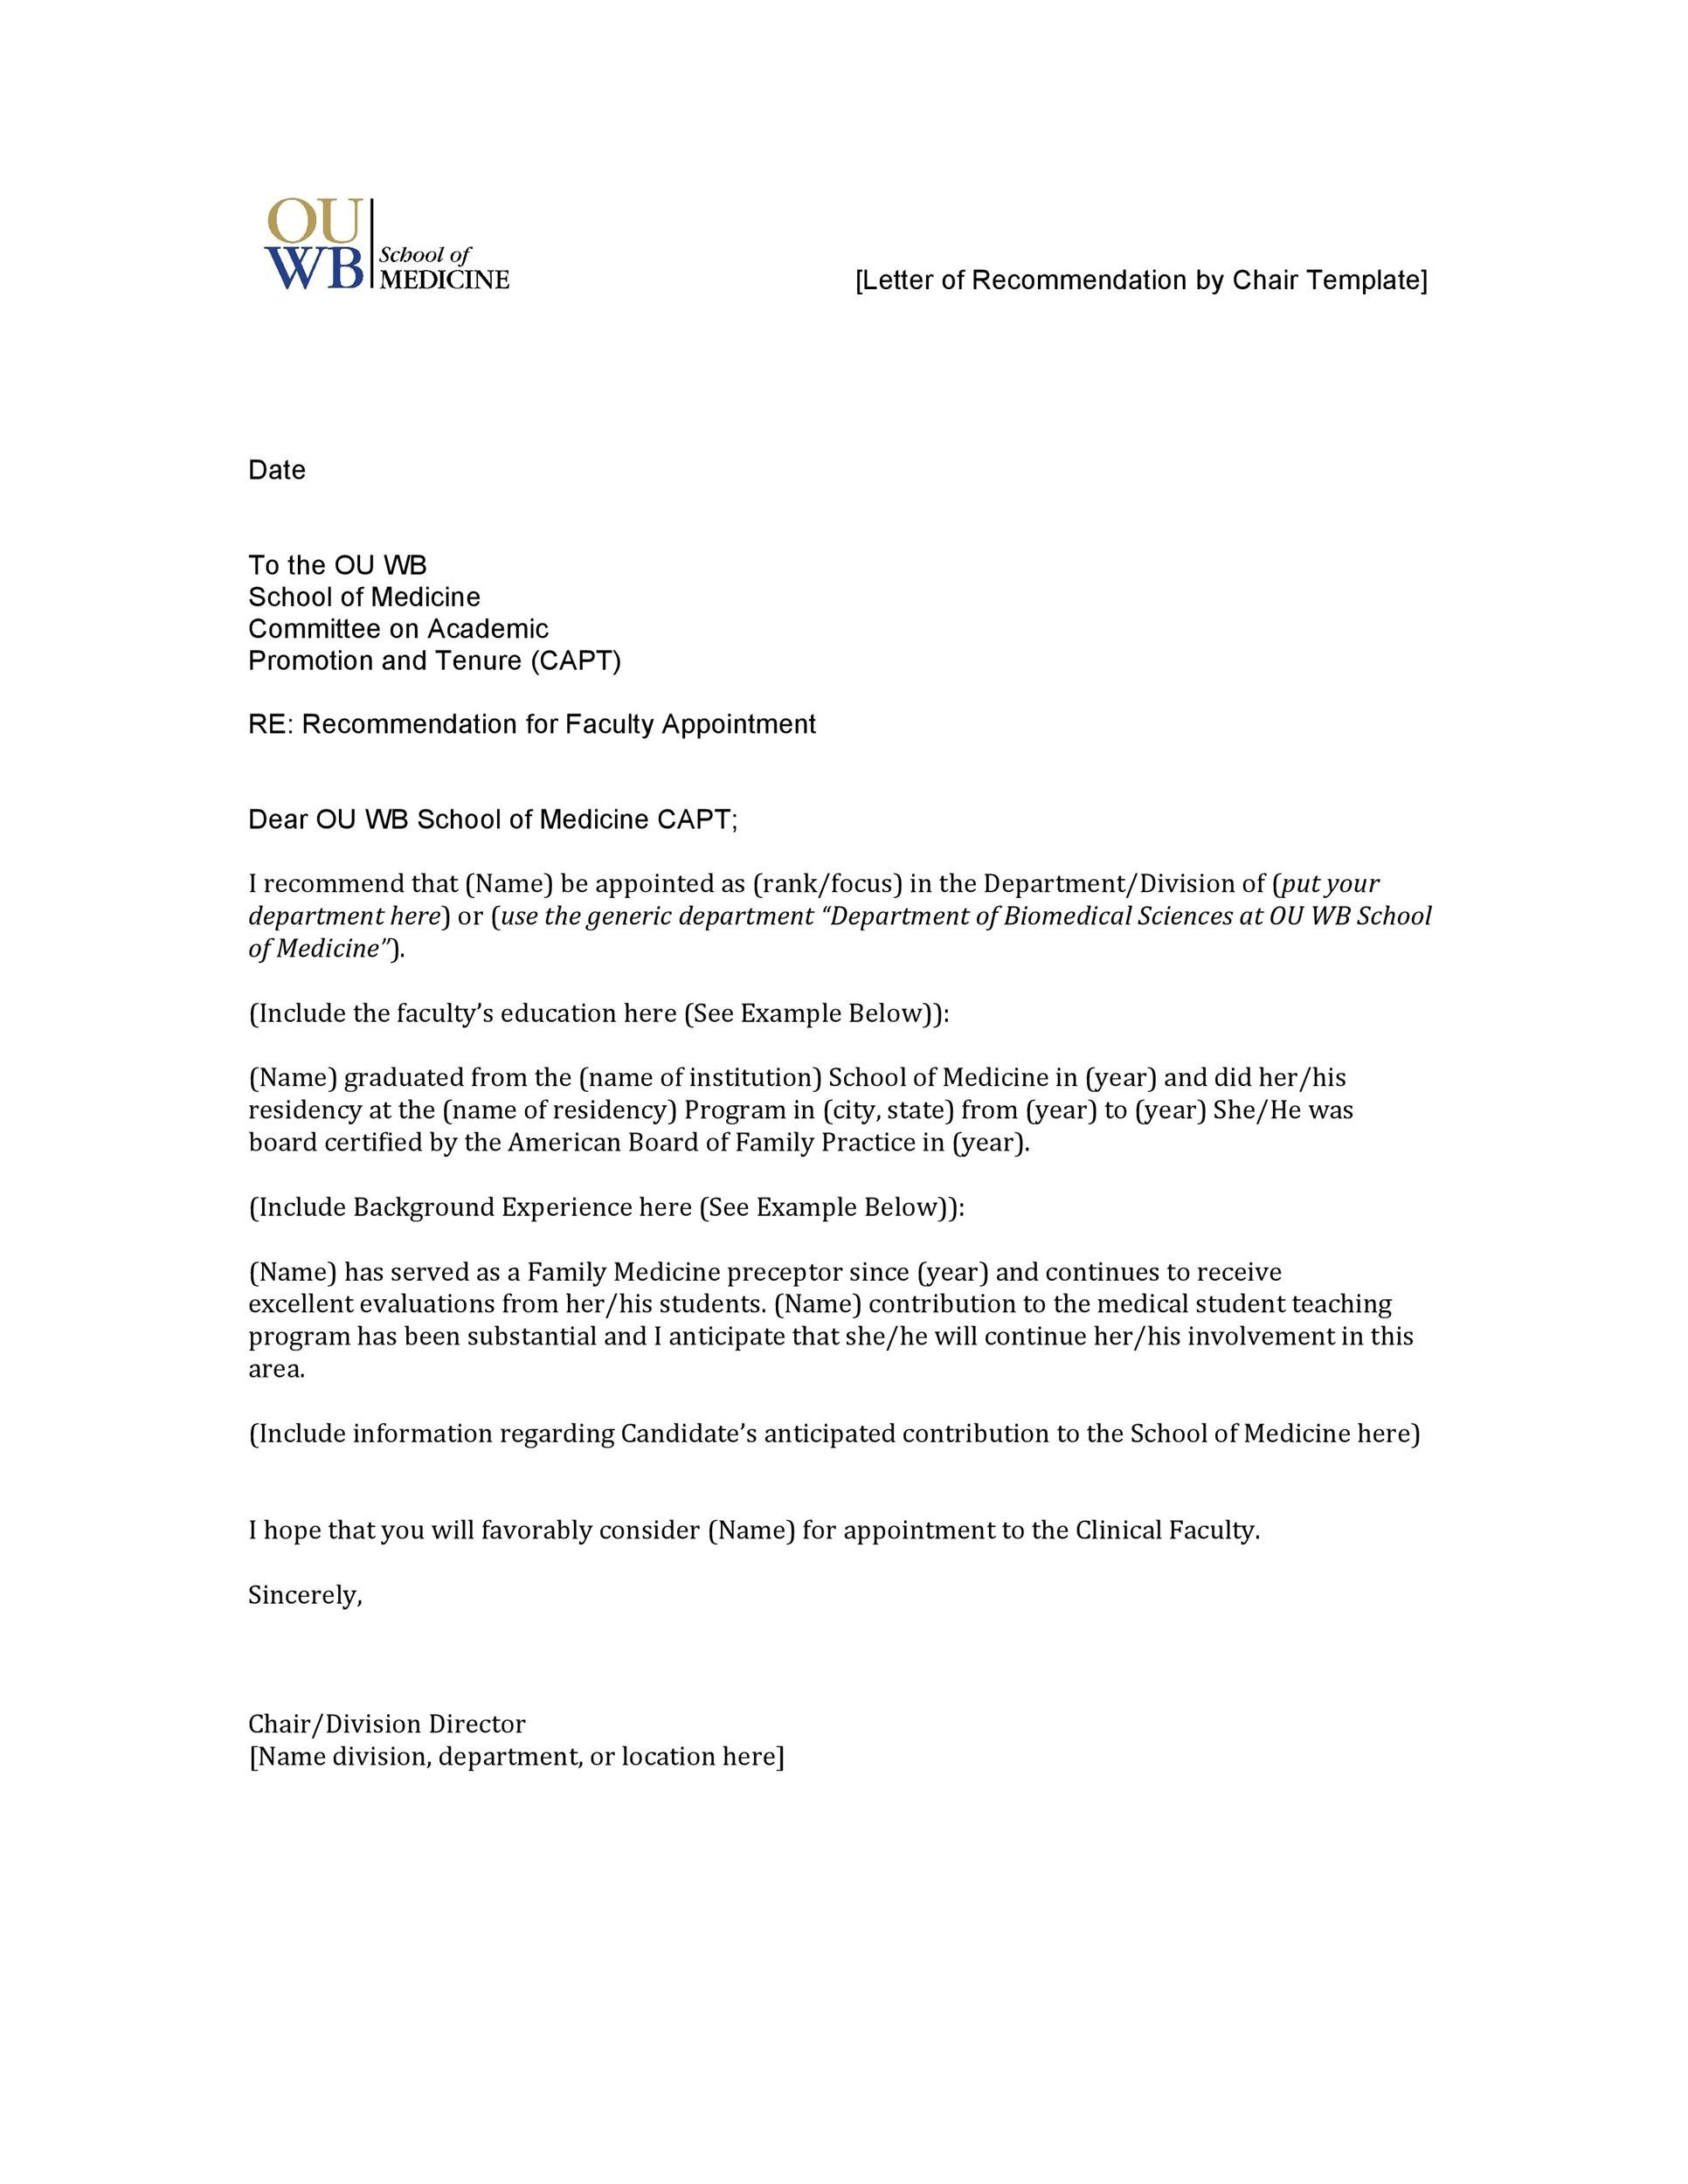 pt school letter of recommendation